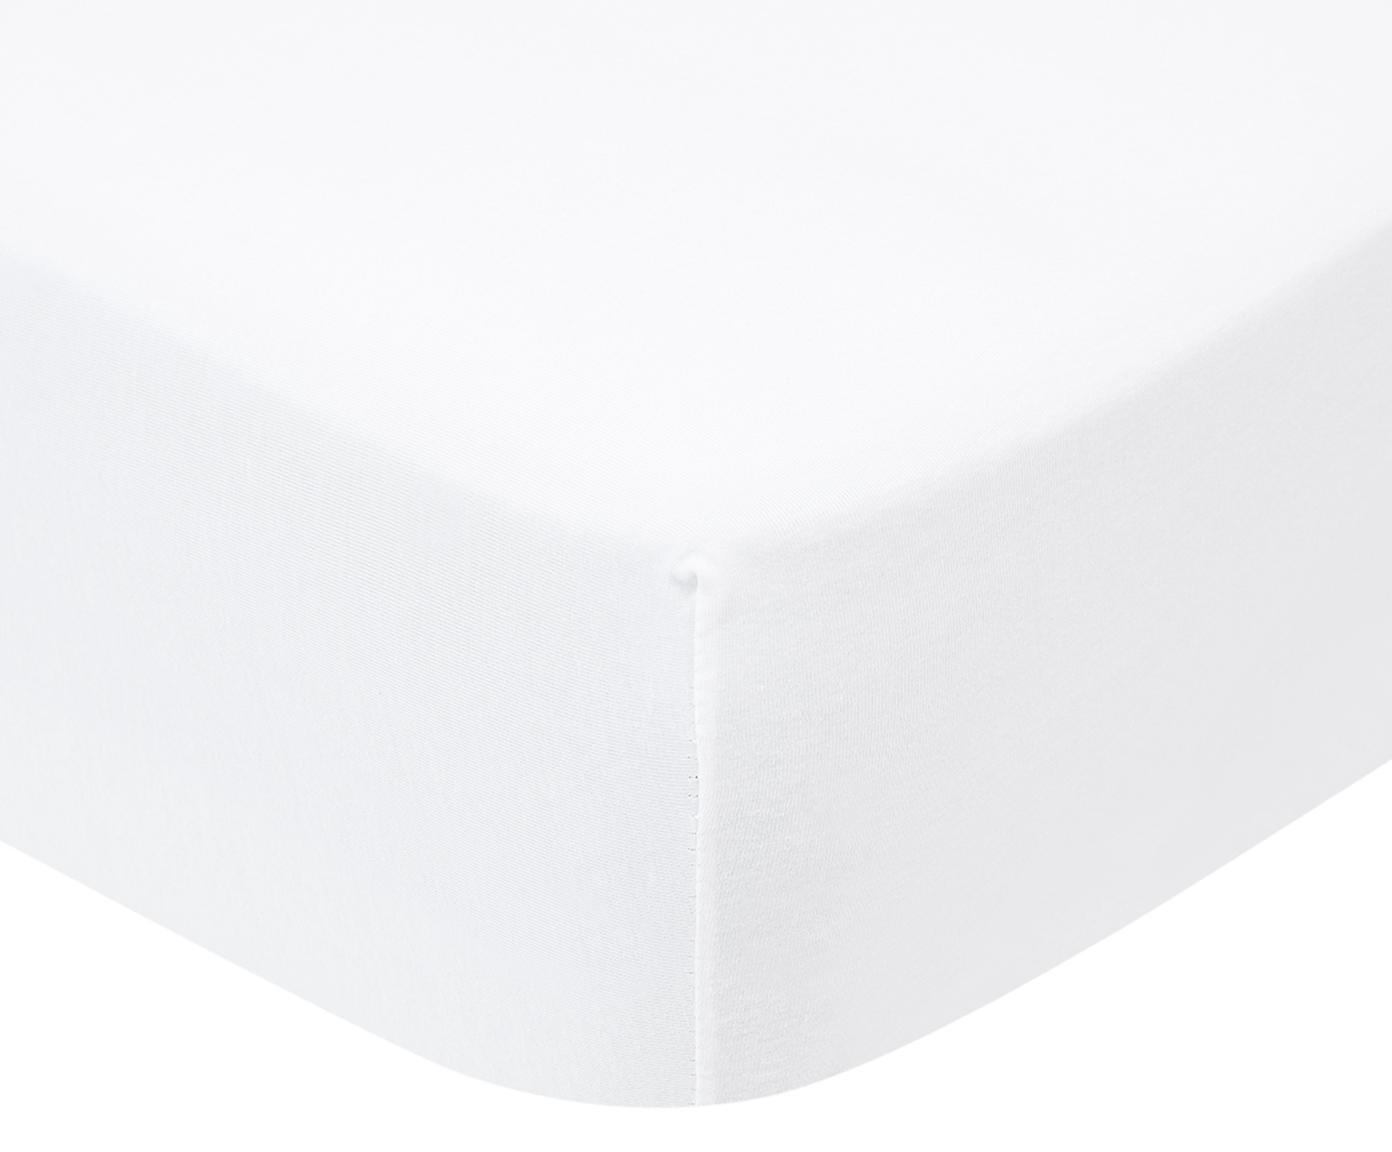 Boxspring-Spannbettlaken Lara, Jersey-Elasthan, 95% Baumwolle, 5% Elasthan, Weiß, 90 x 200 cm